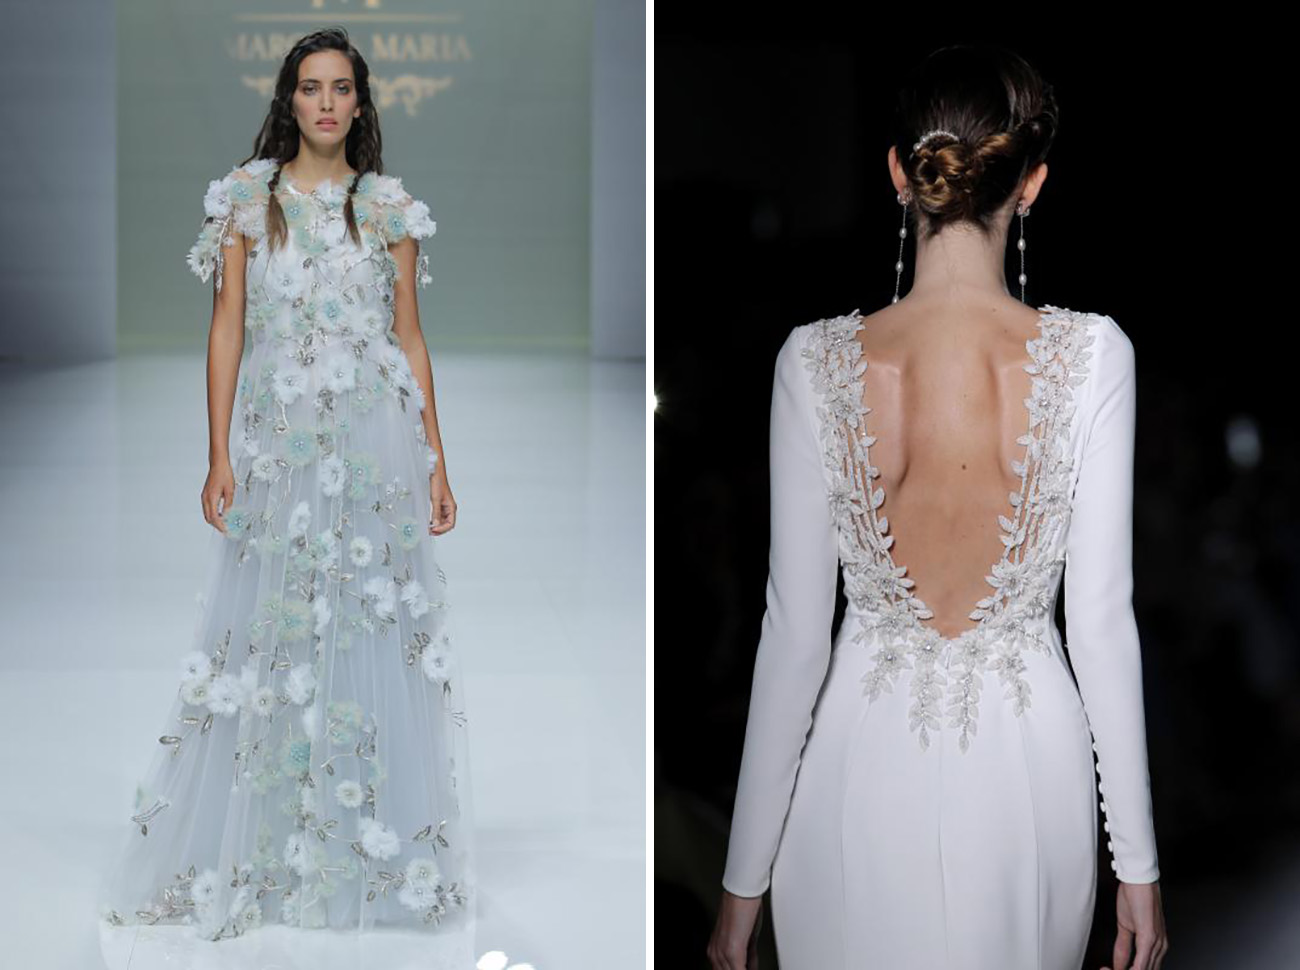 Colorful Wedding Suit Hire Wigan Frieze - Wedding Dresses & Bridal ...